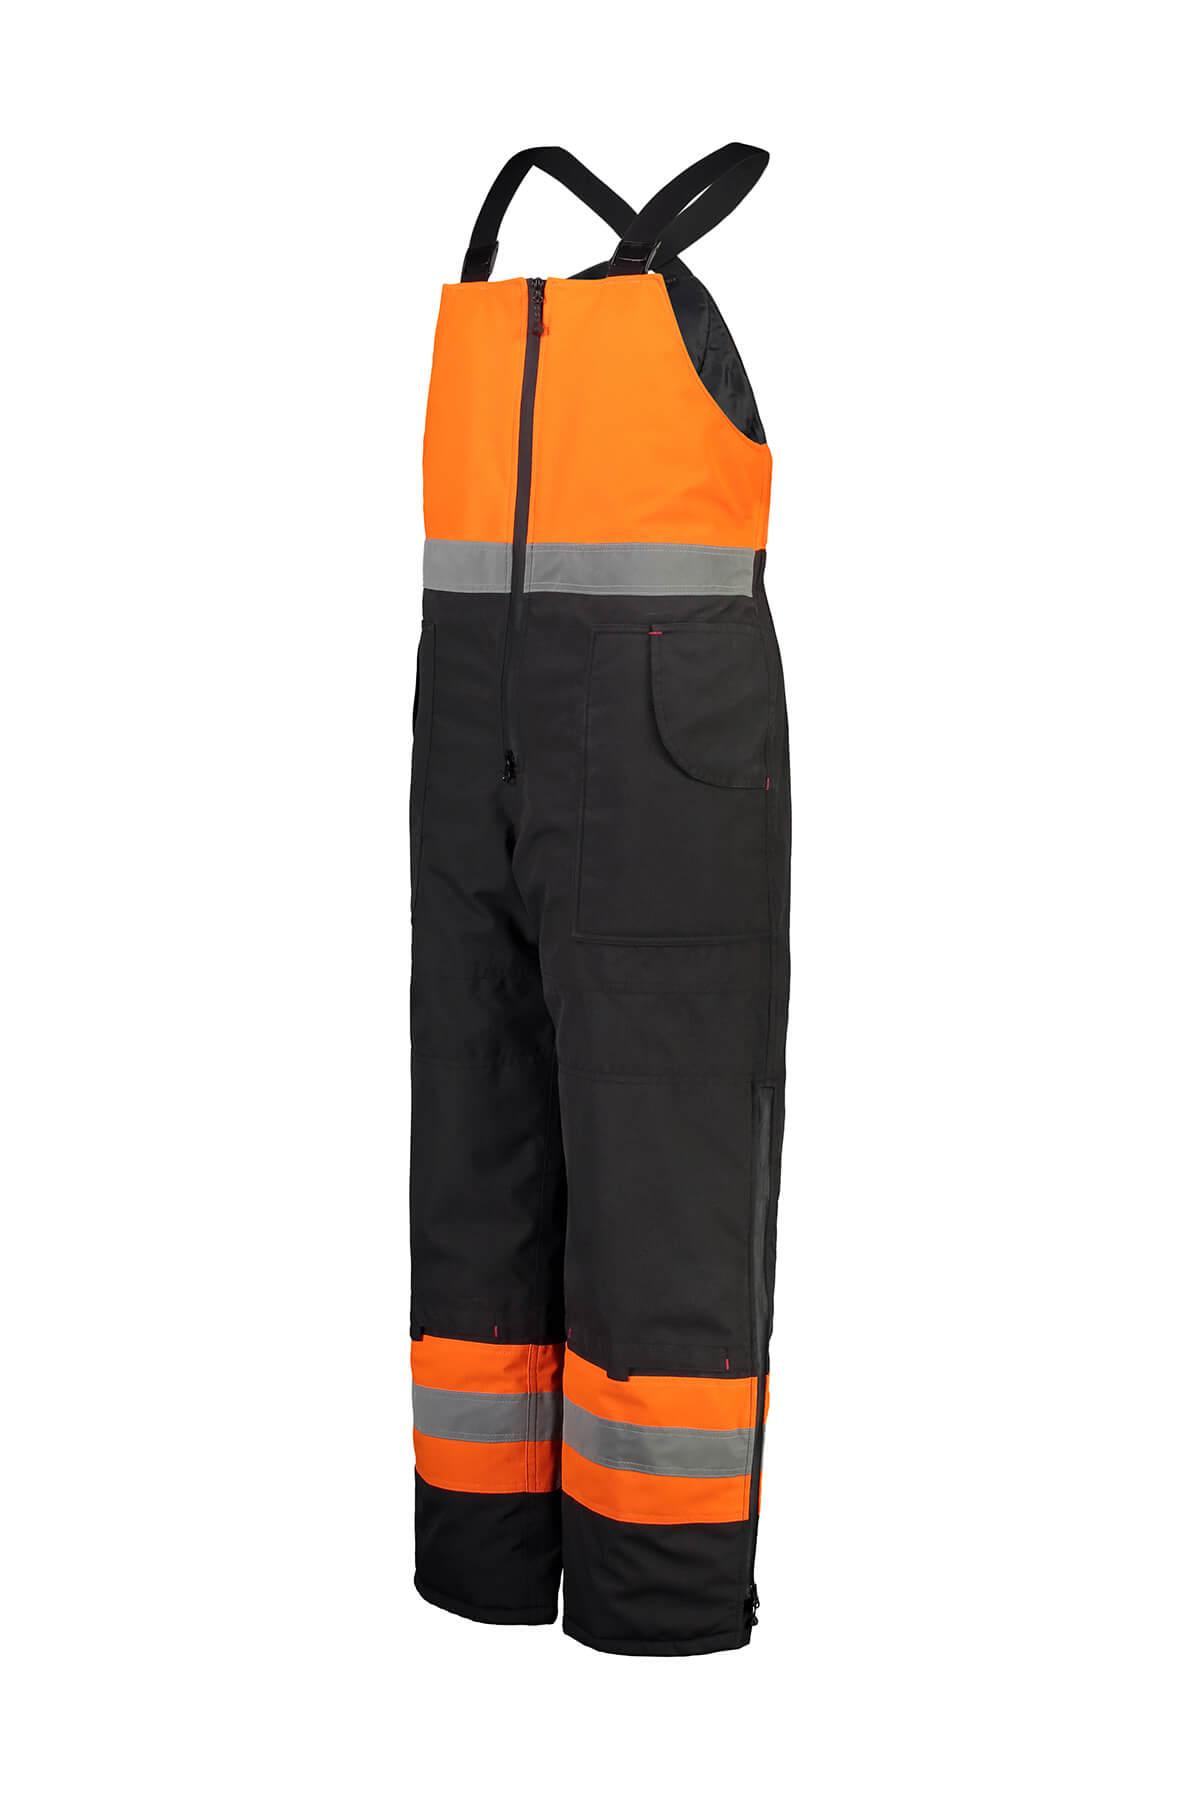 Mannequin photography of mens overalls workwear in orange Fluro